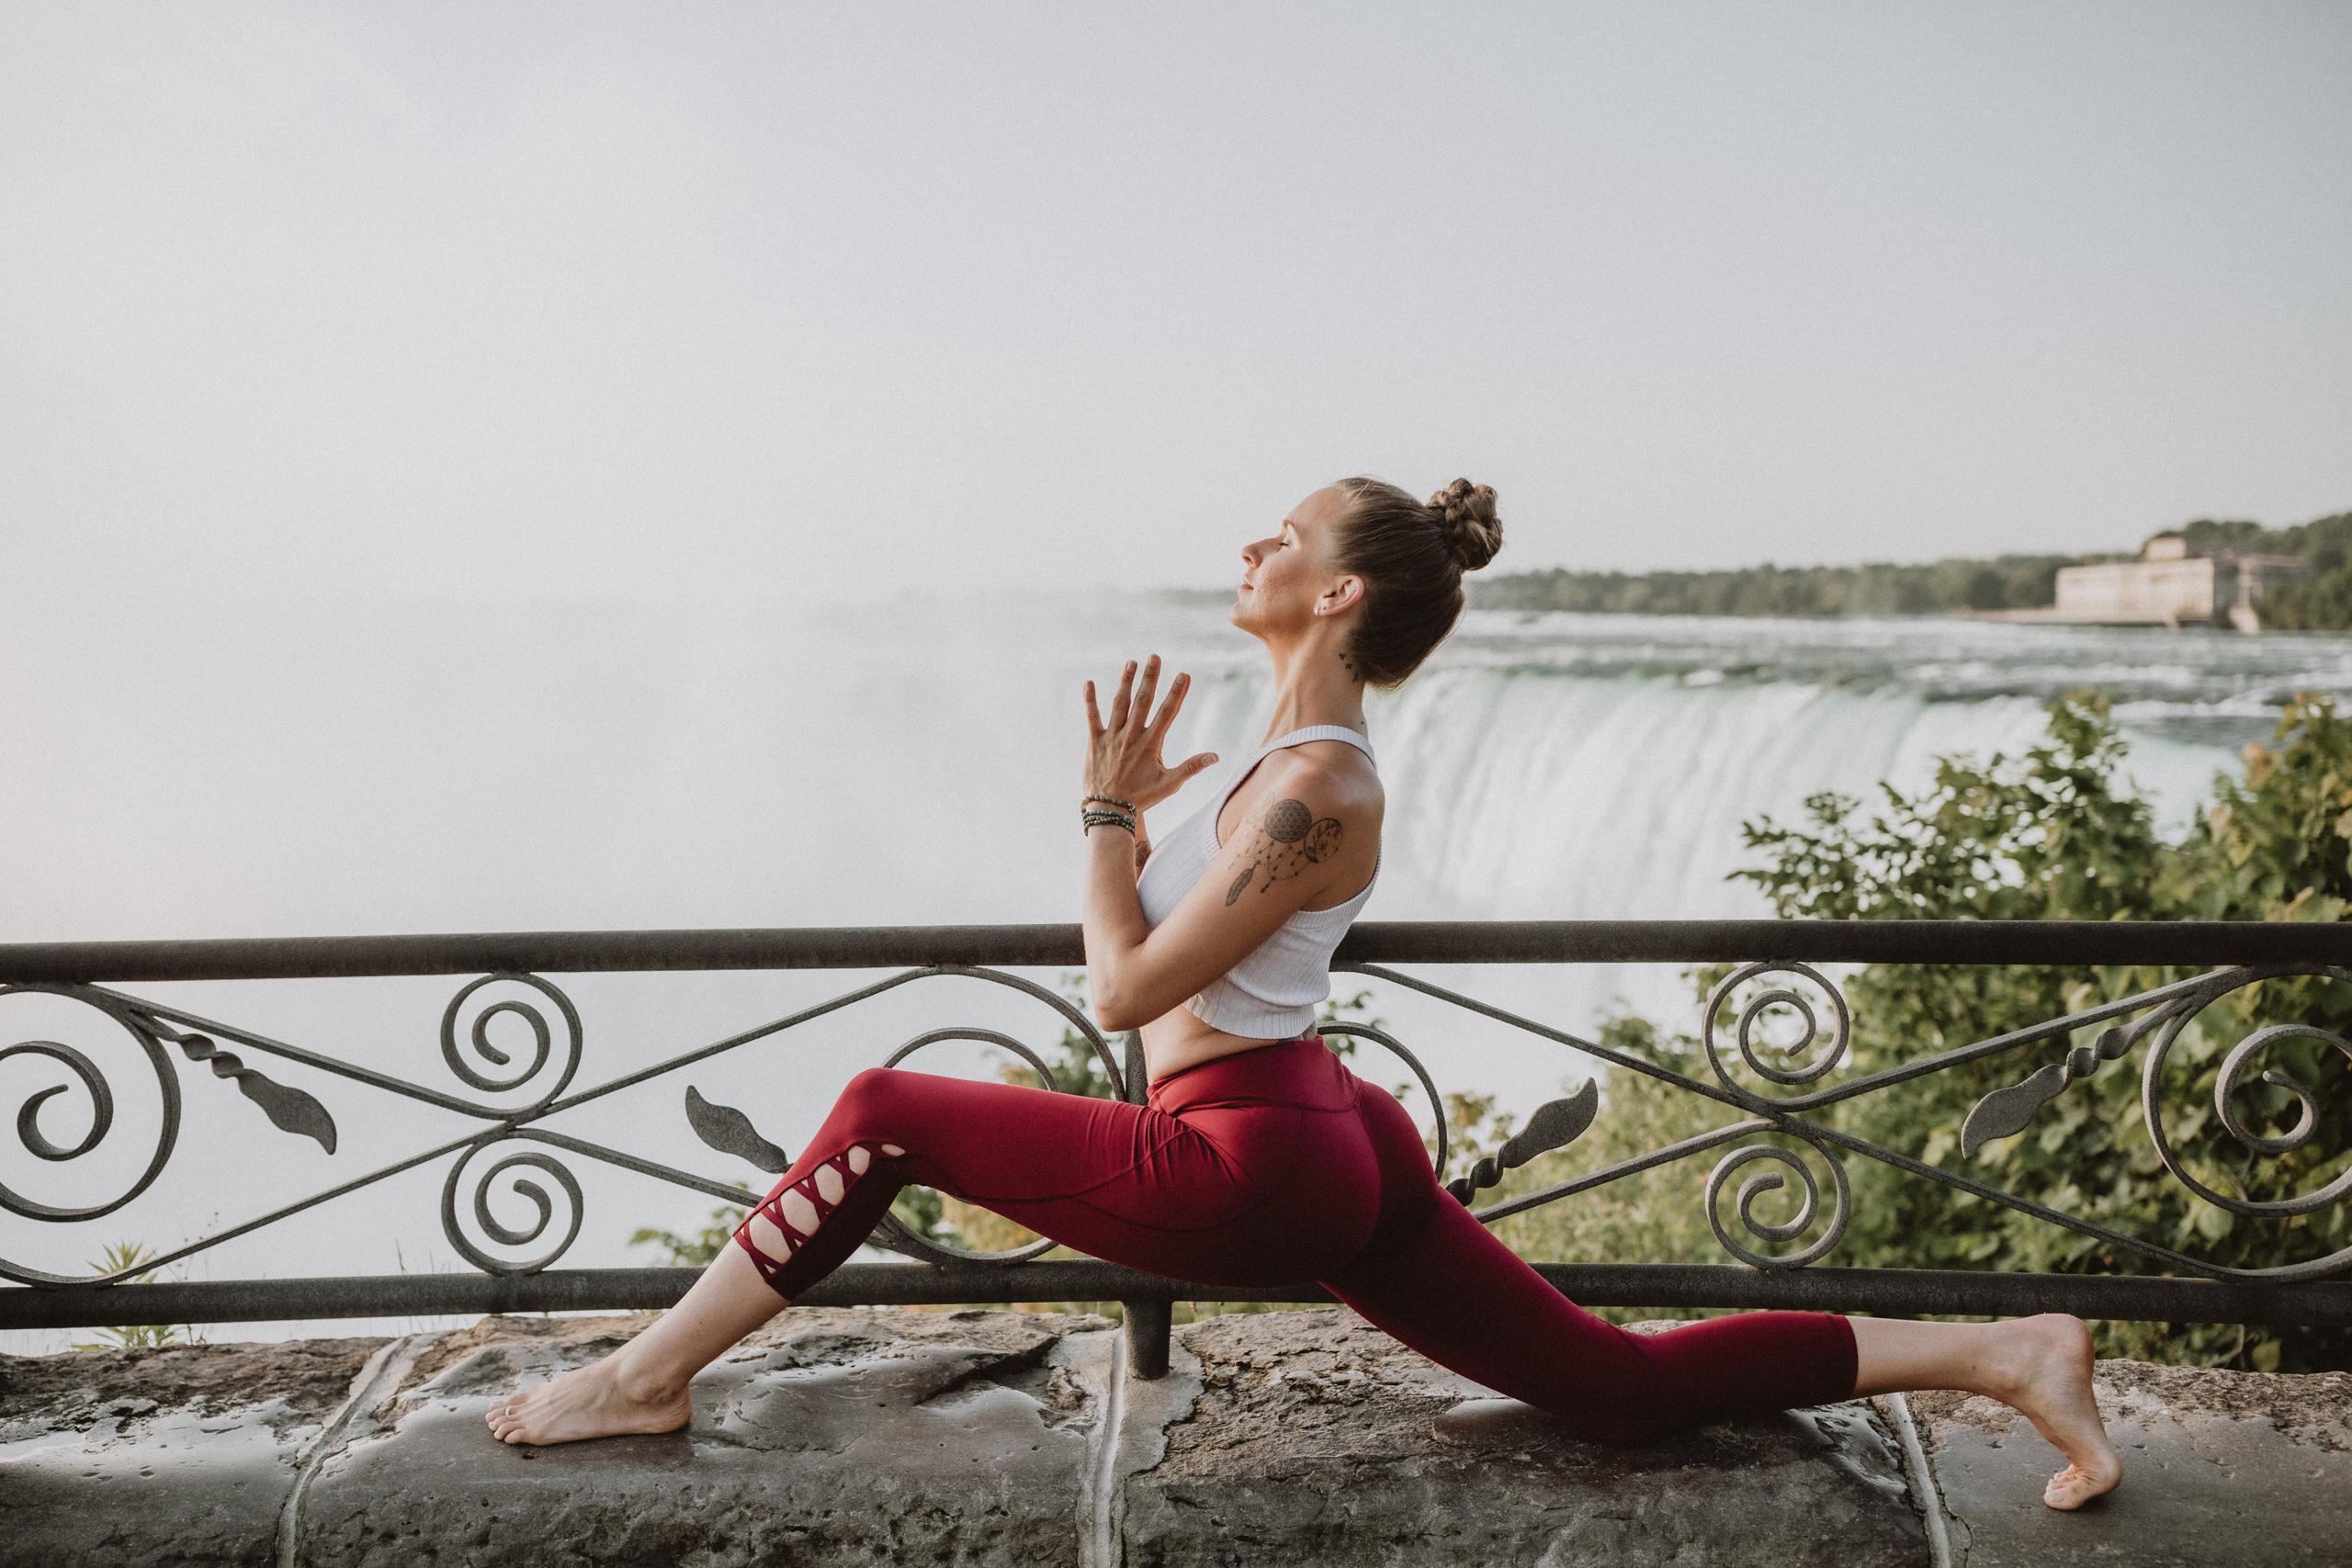 niagara falls yoga pose kristina vatra wellness outdoor